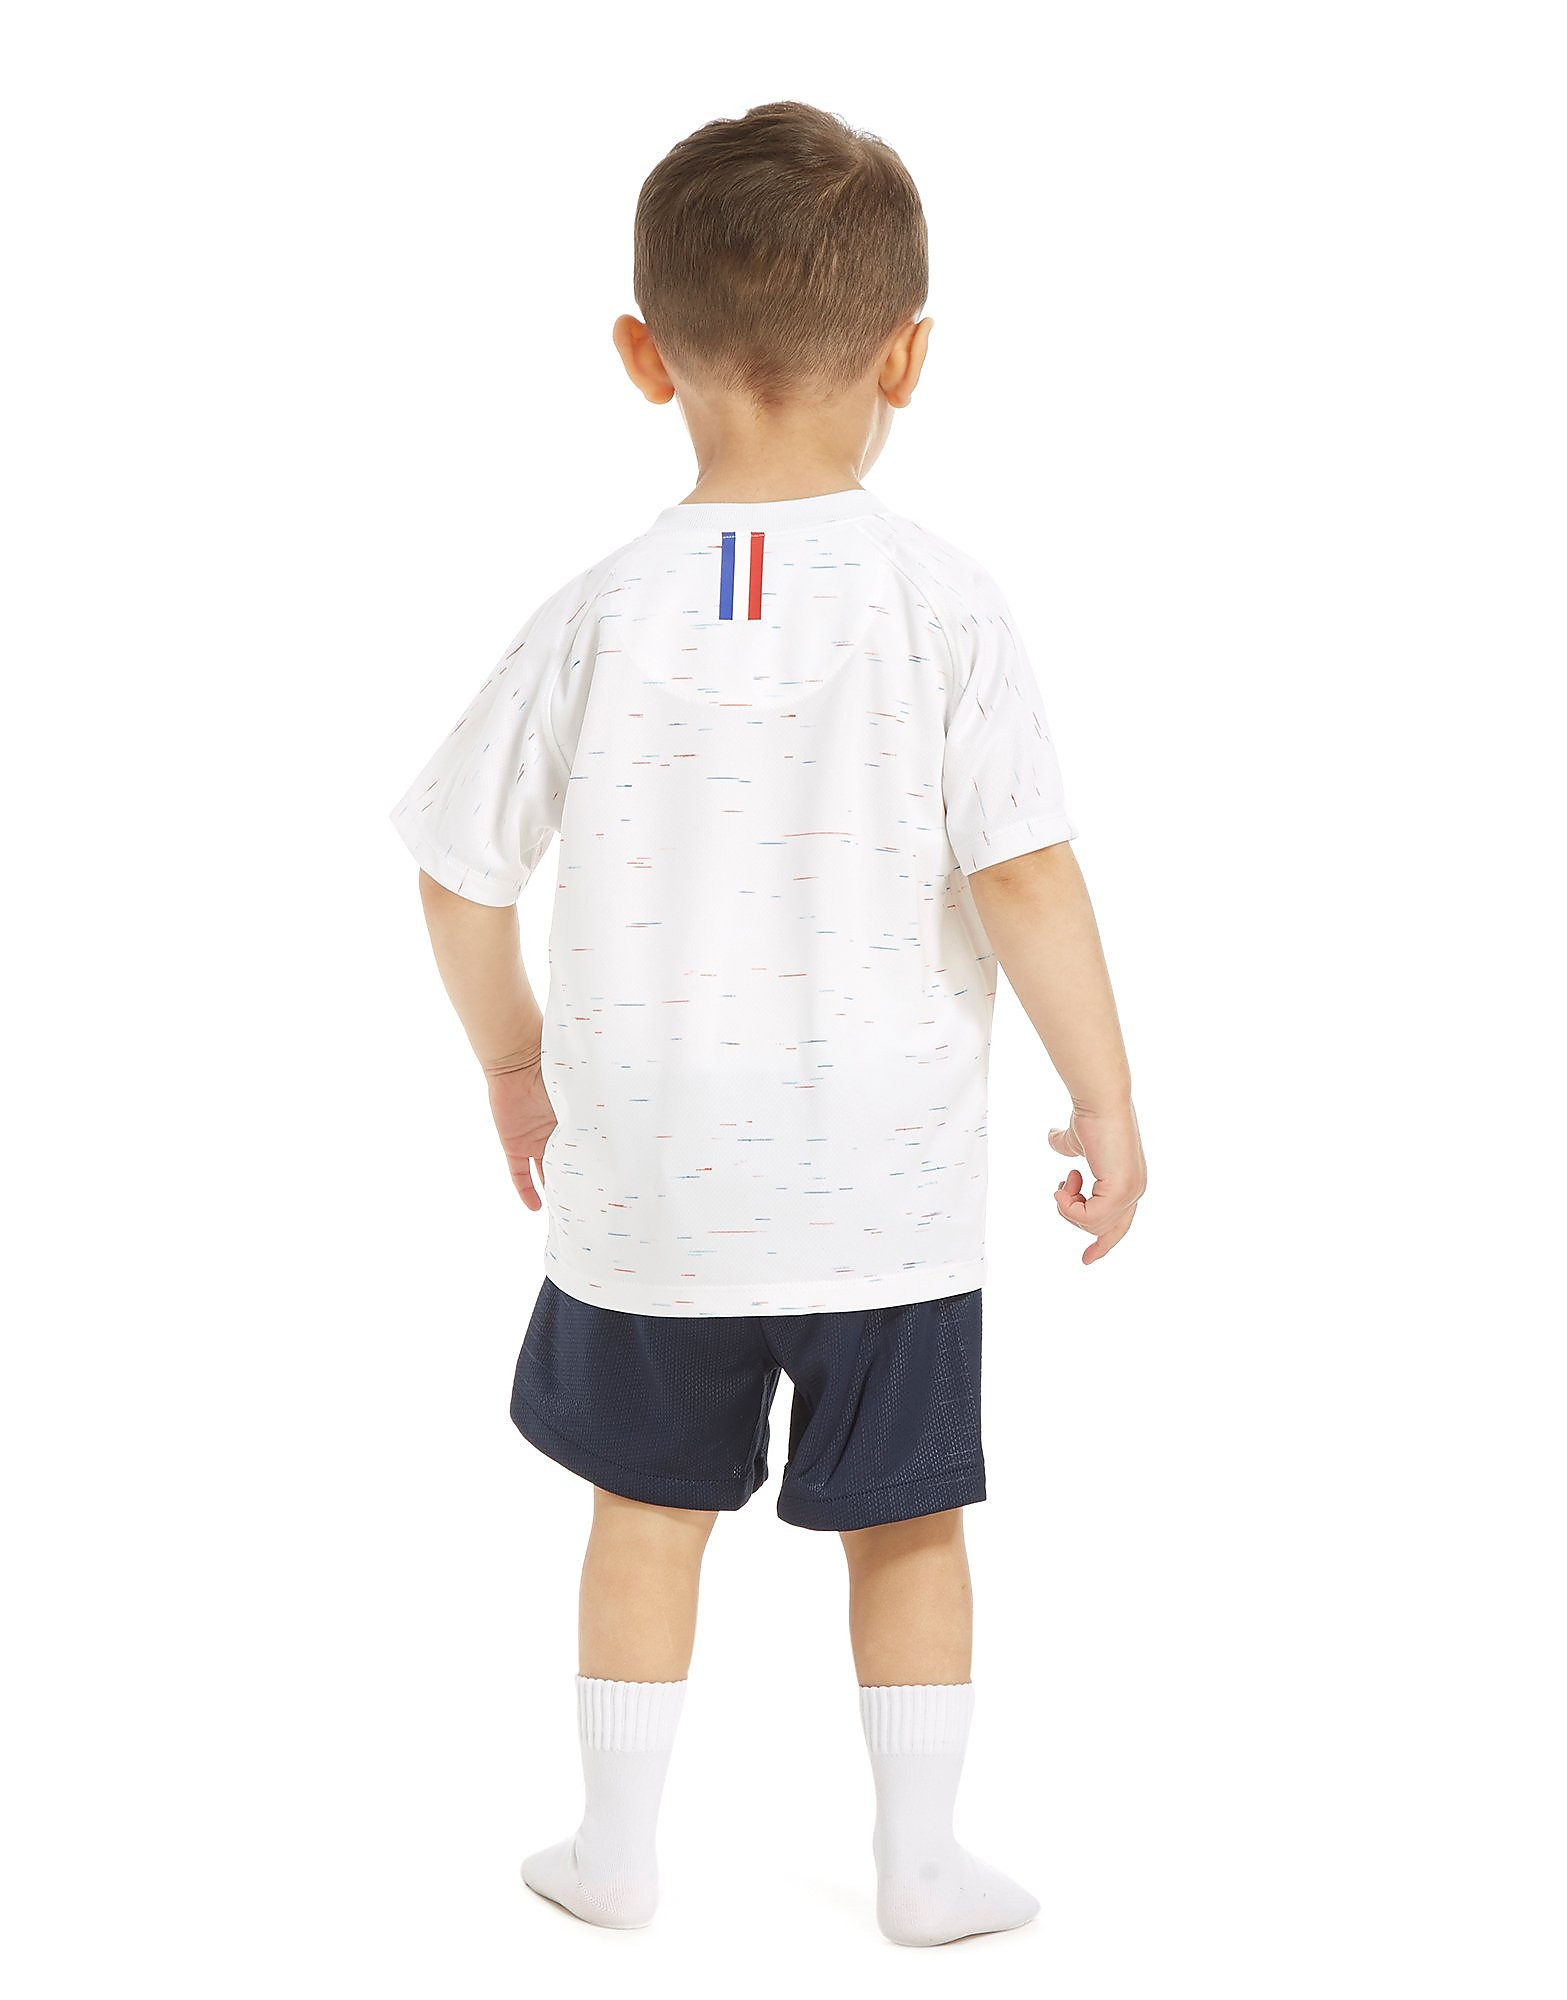 Nike Francia 2018 Completo Away